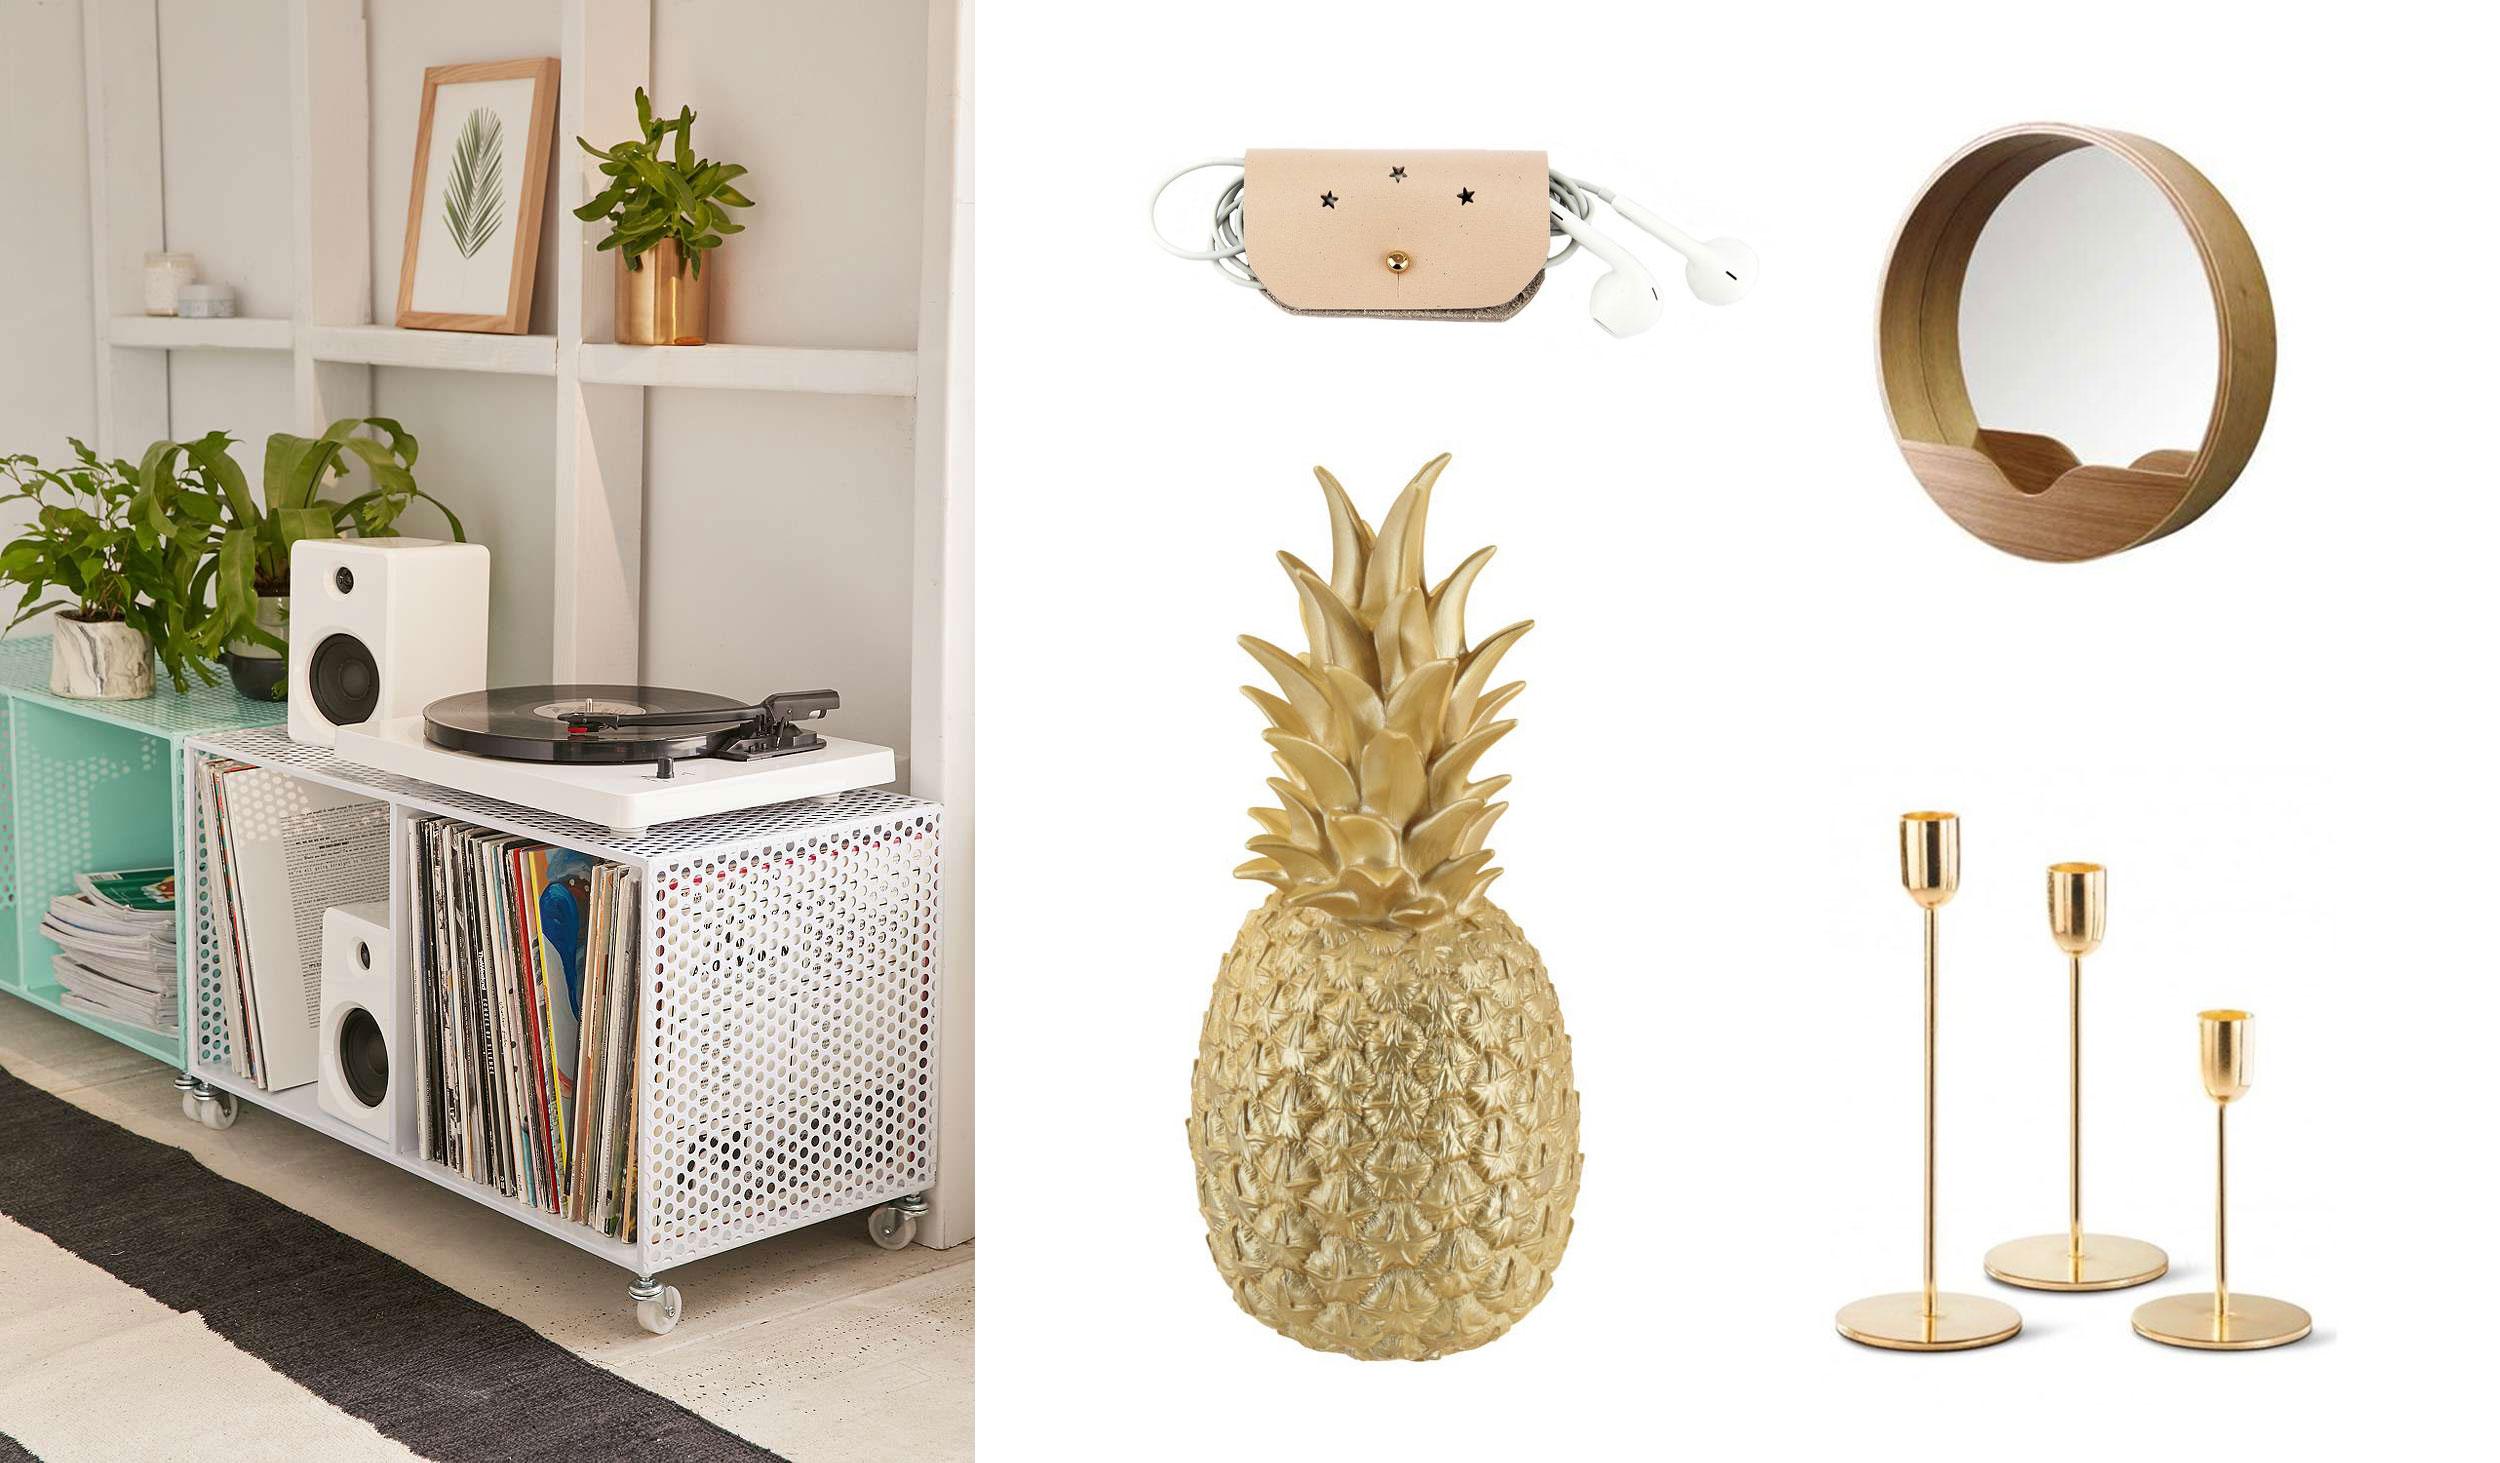 soldes mode deco meuble rangement lampe ananas la seinographe. Black Bedroom Furniture Sets. Home Design Ideas